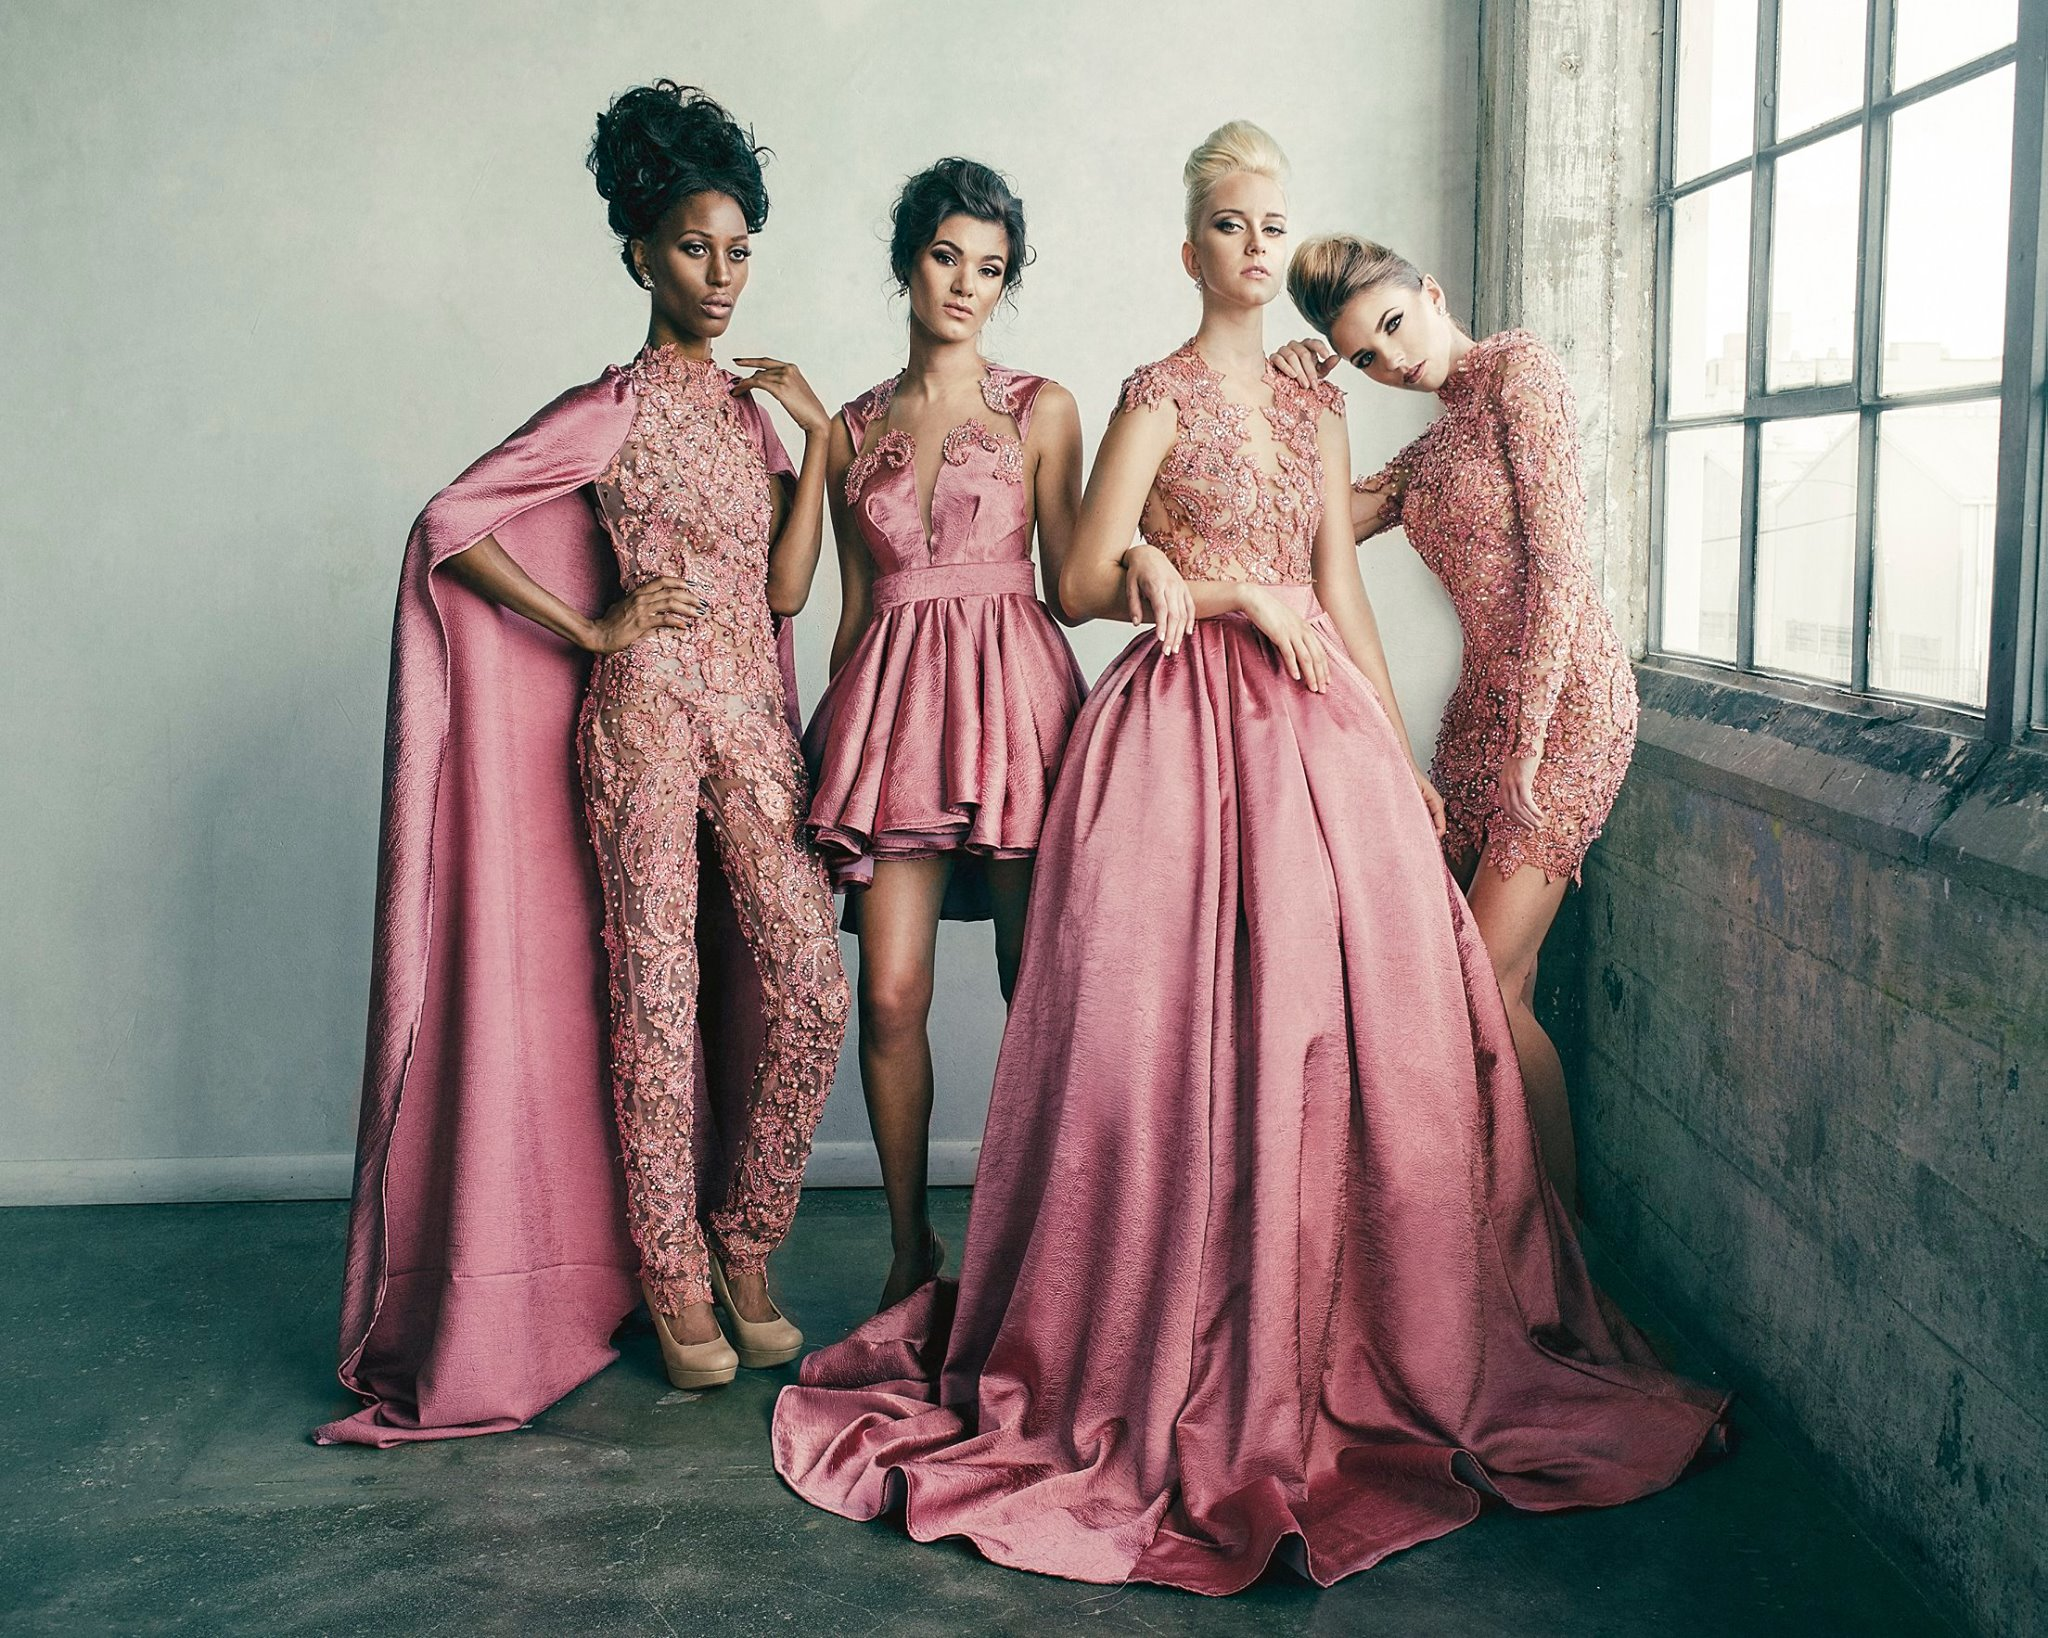 new york fashion week photographer.jpg